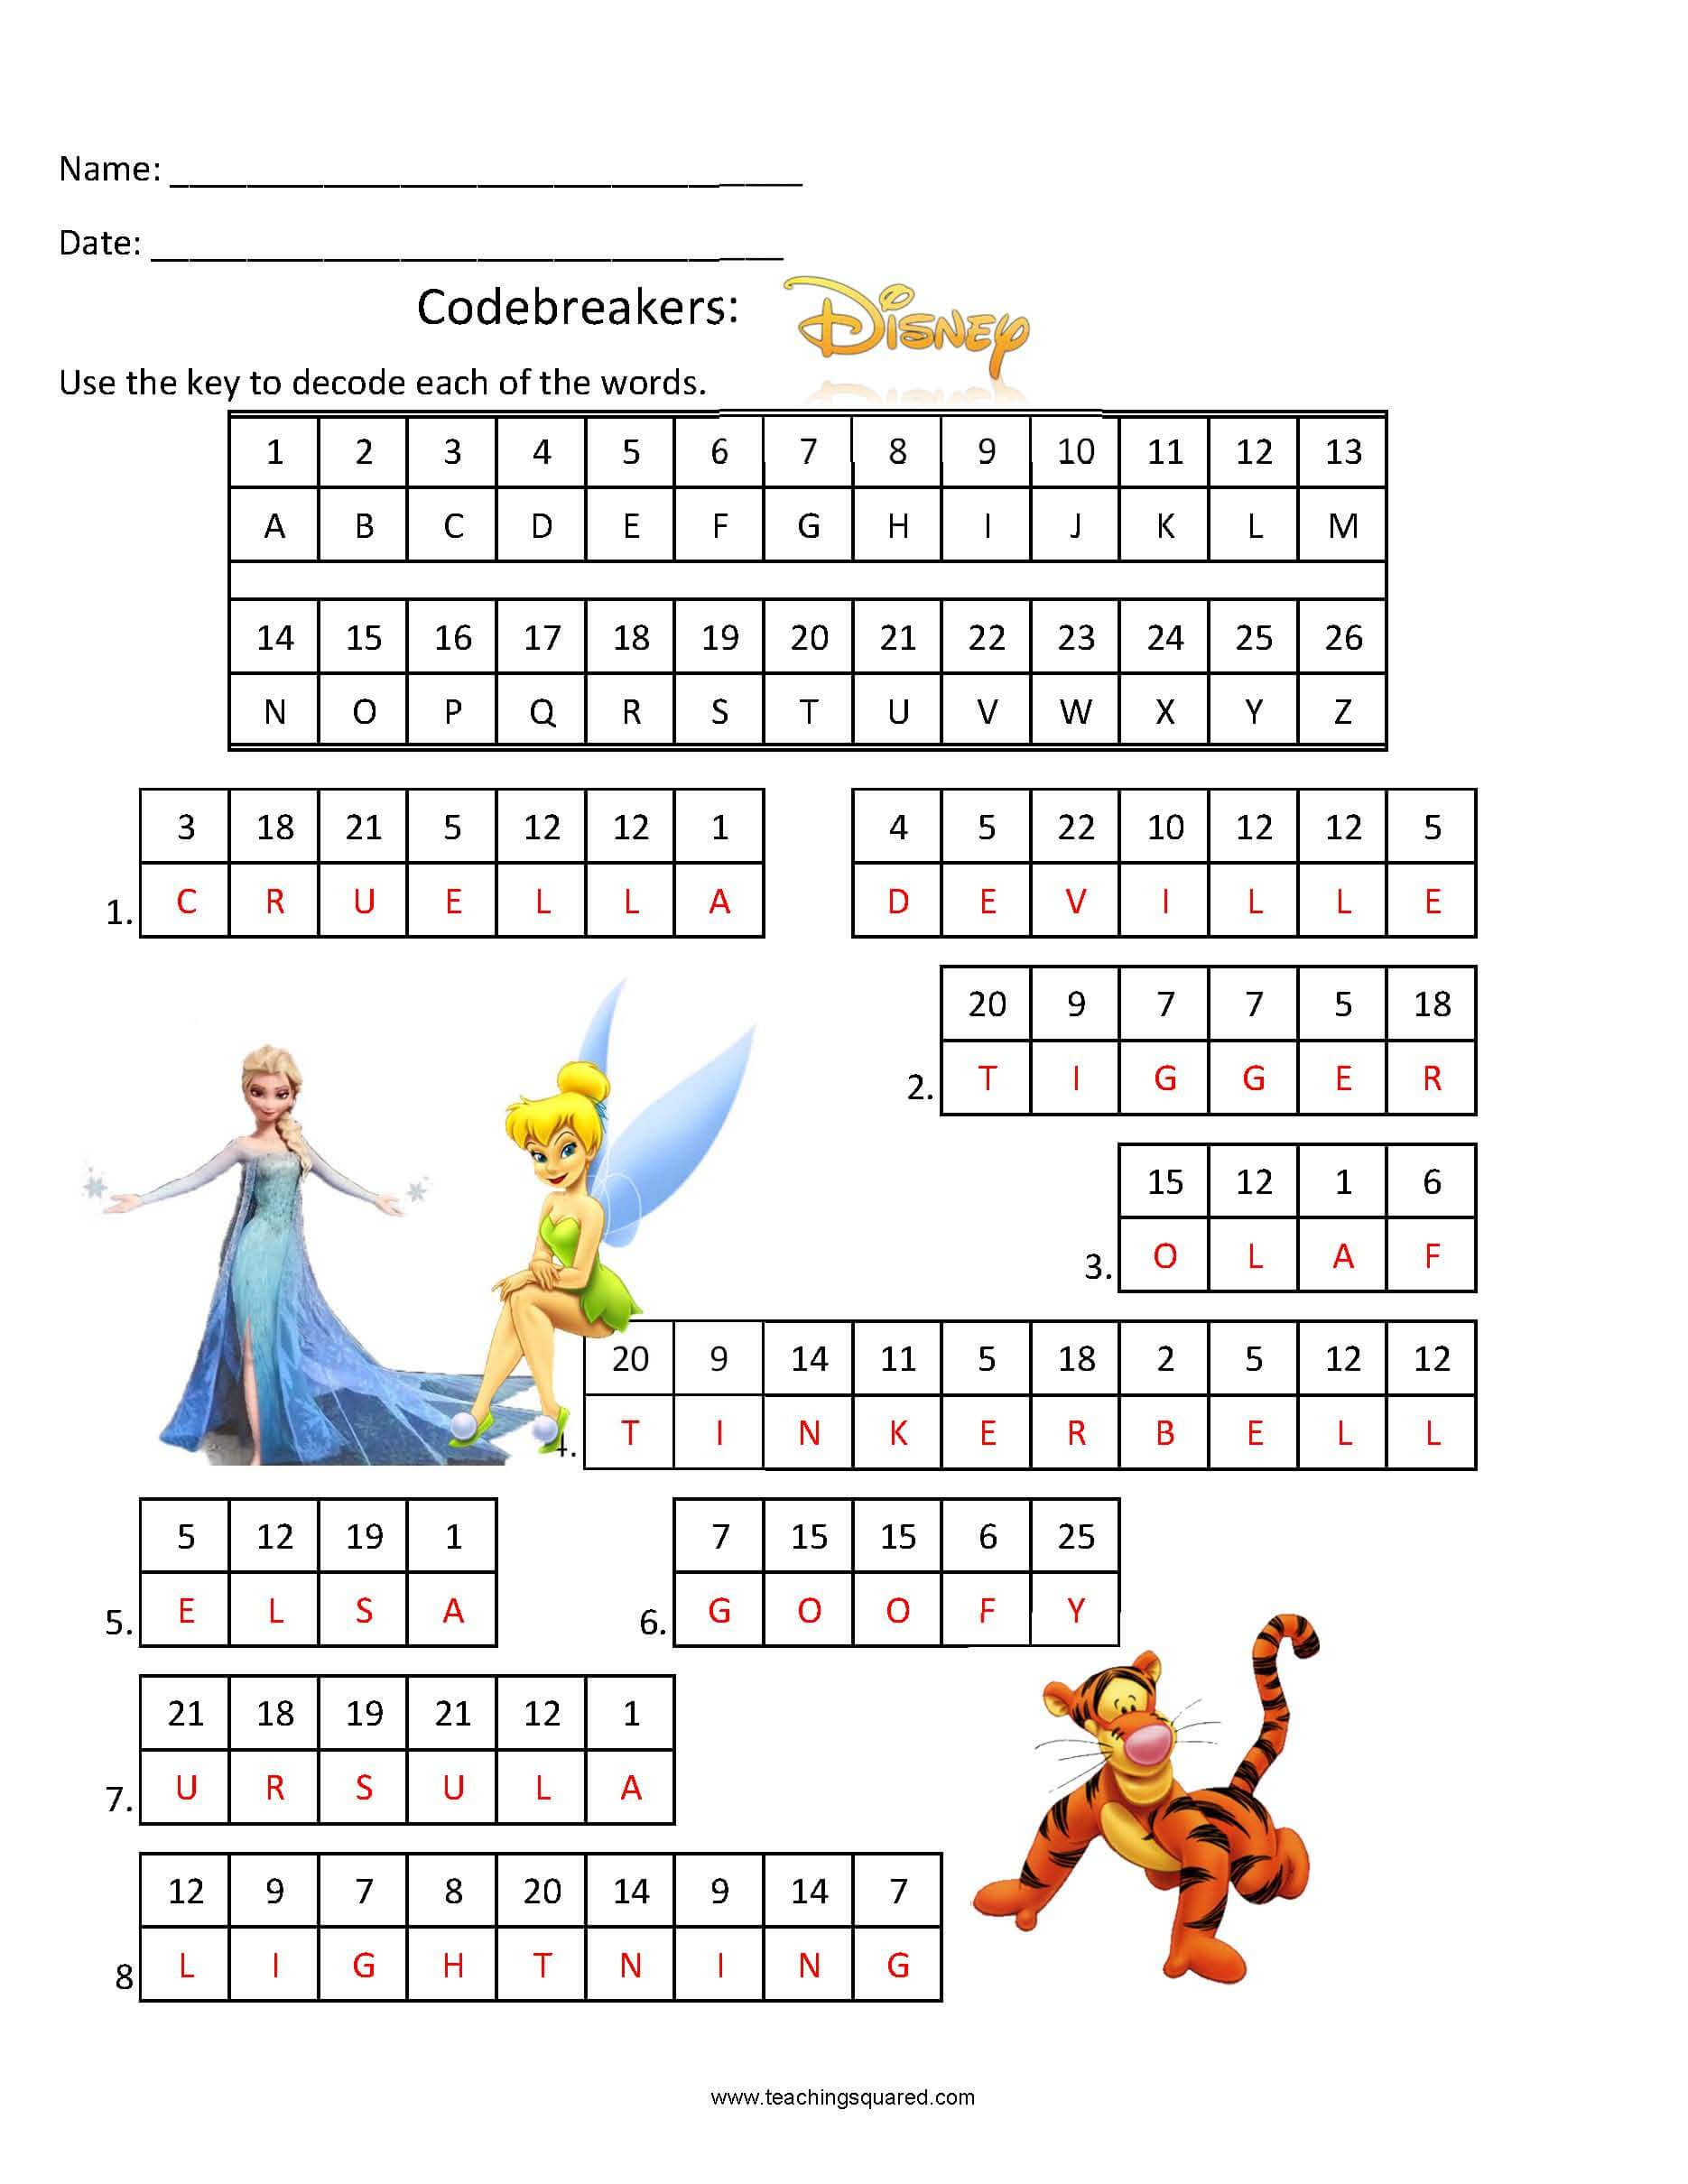 Codebreakers- Disney Fun Puzzle for kids